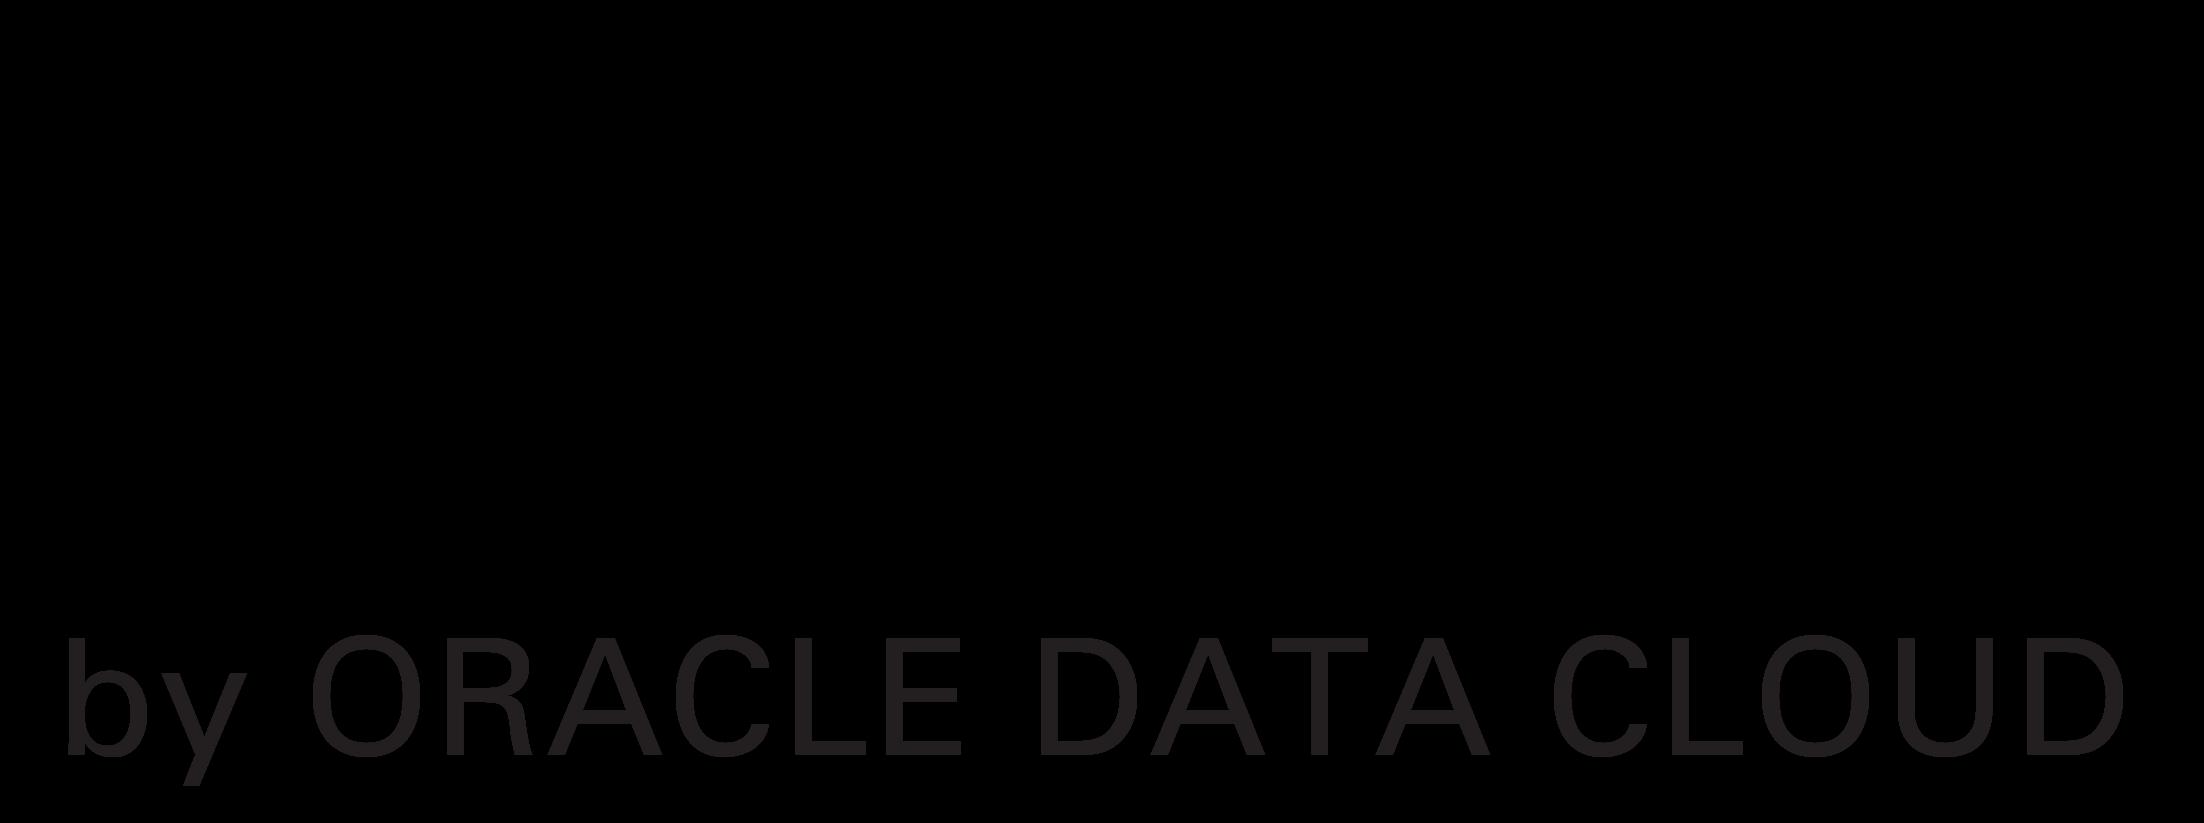 Oracle Data Cloud logo